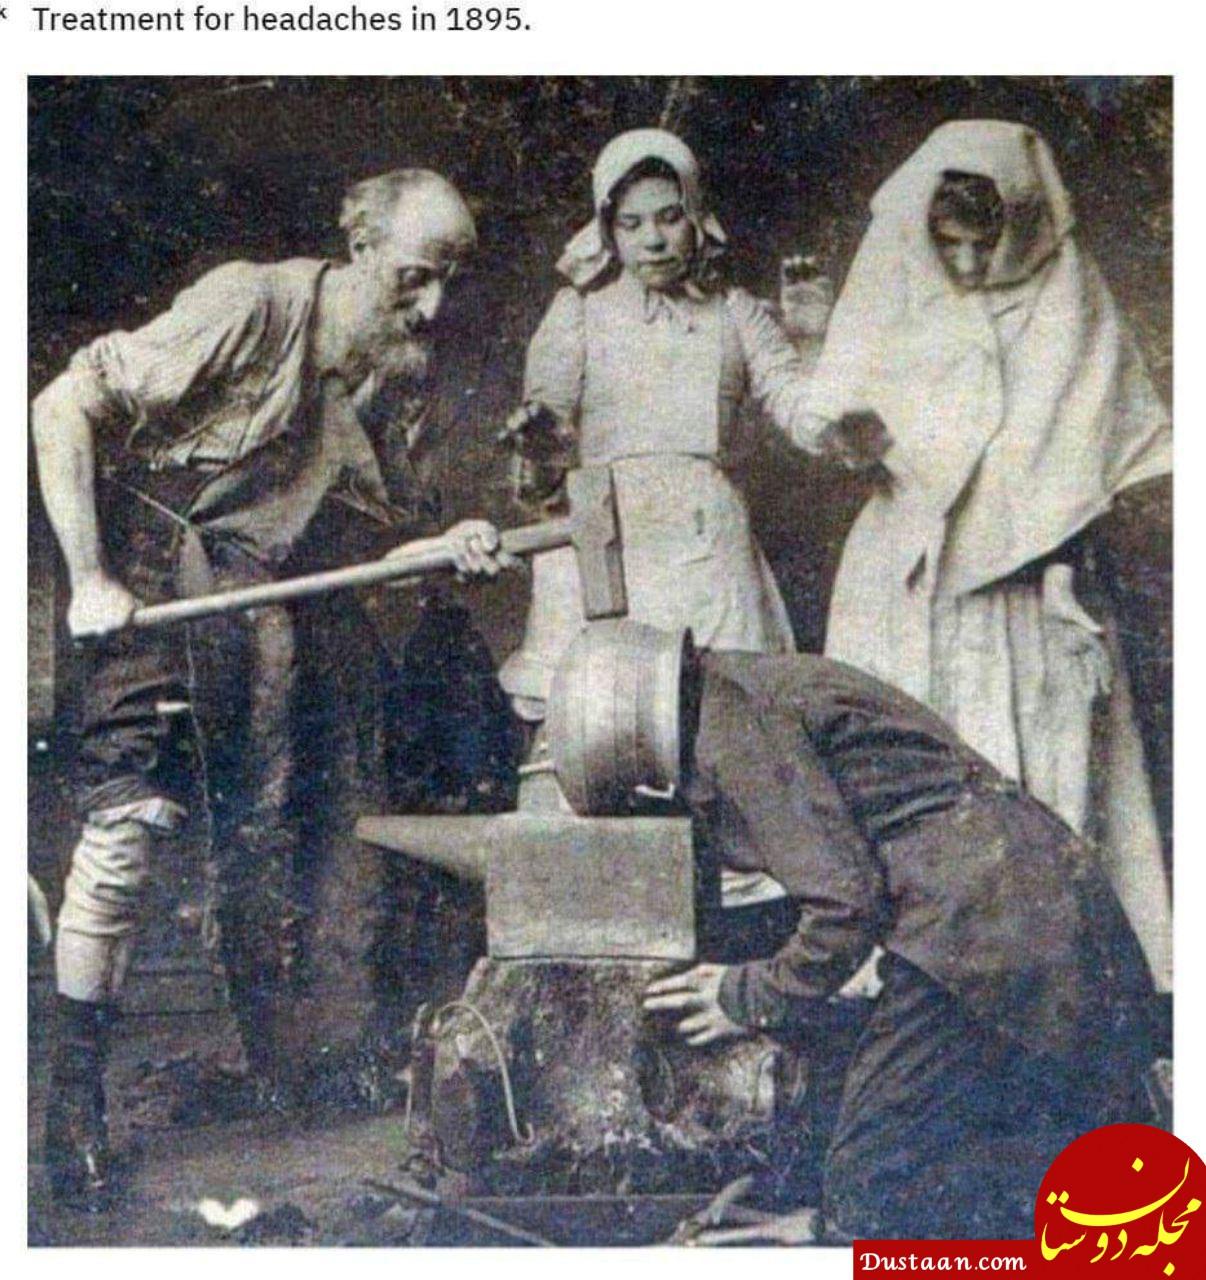 www.dustaan.com درمان عجیب سردرد در سال ۱۸۹۵ ! +عکس